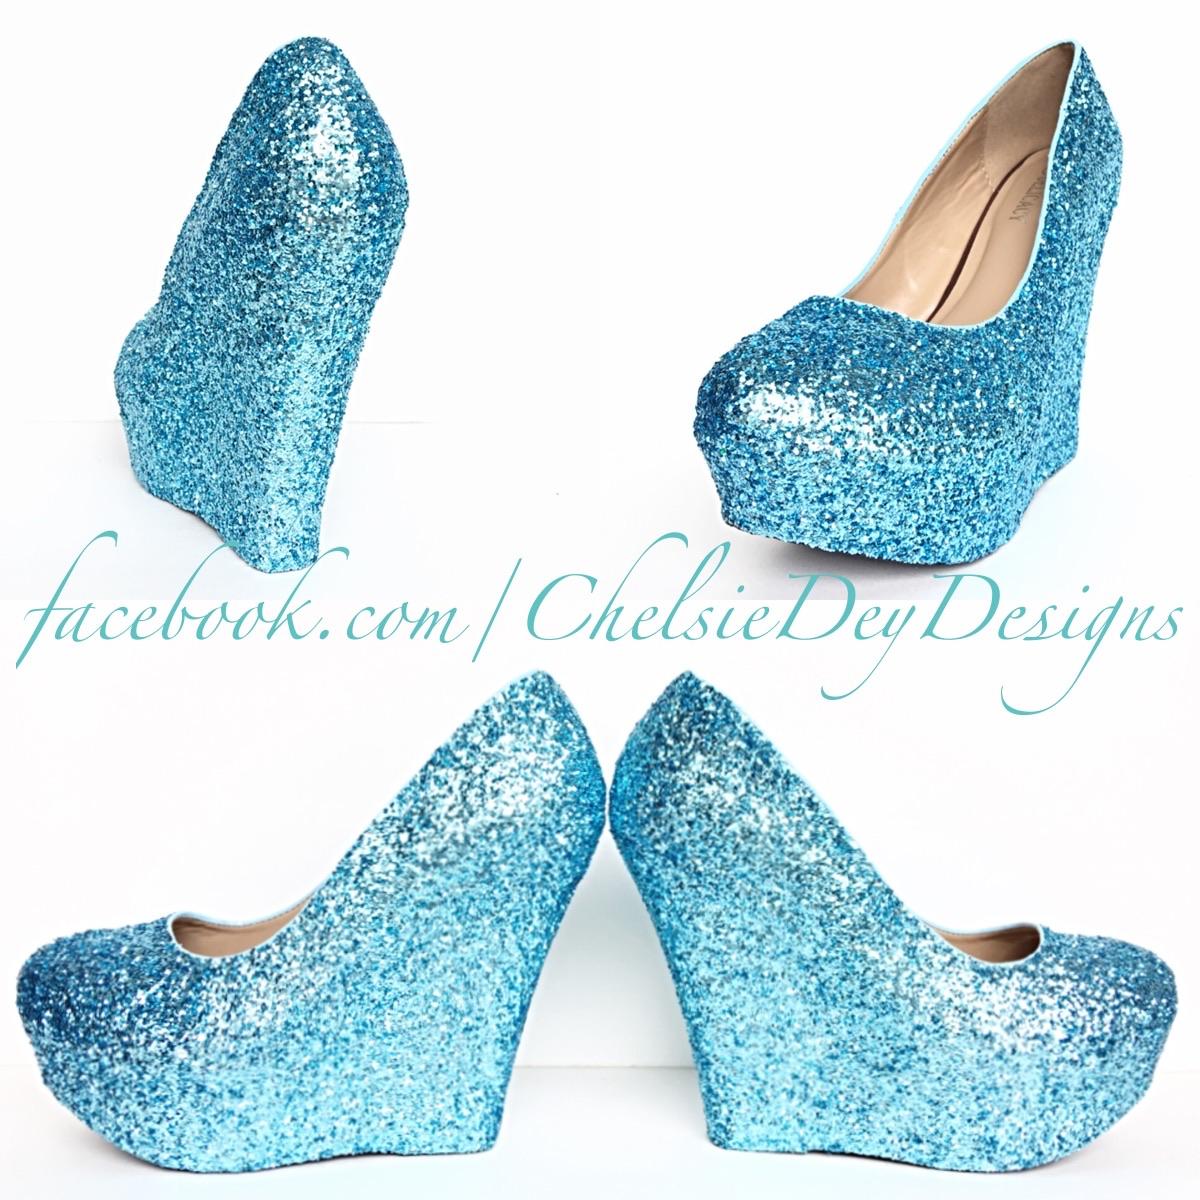 93de8bfb14e Tiffany Blue Glitter Wedges - Aqua Light Blue Heels - Robins Egg ...